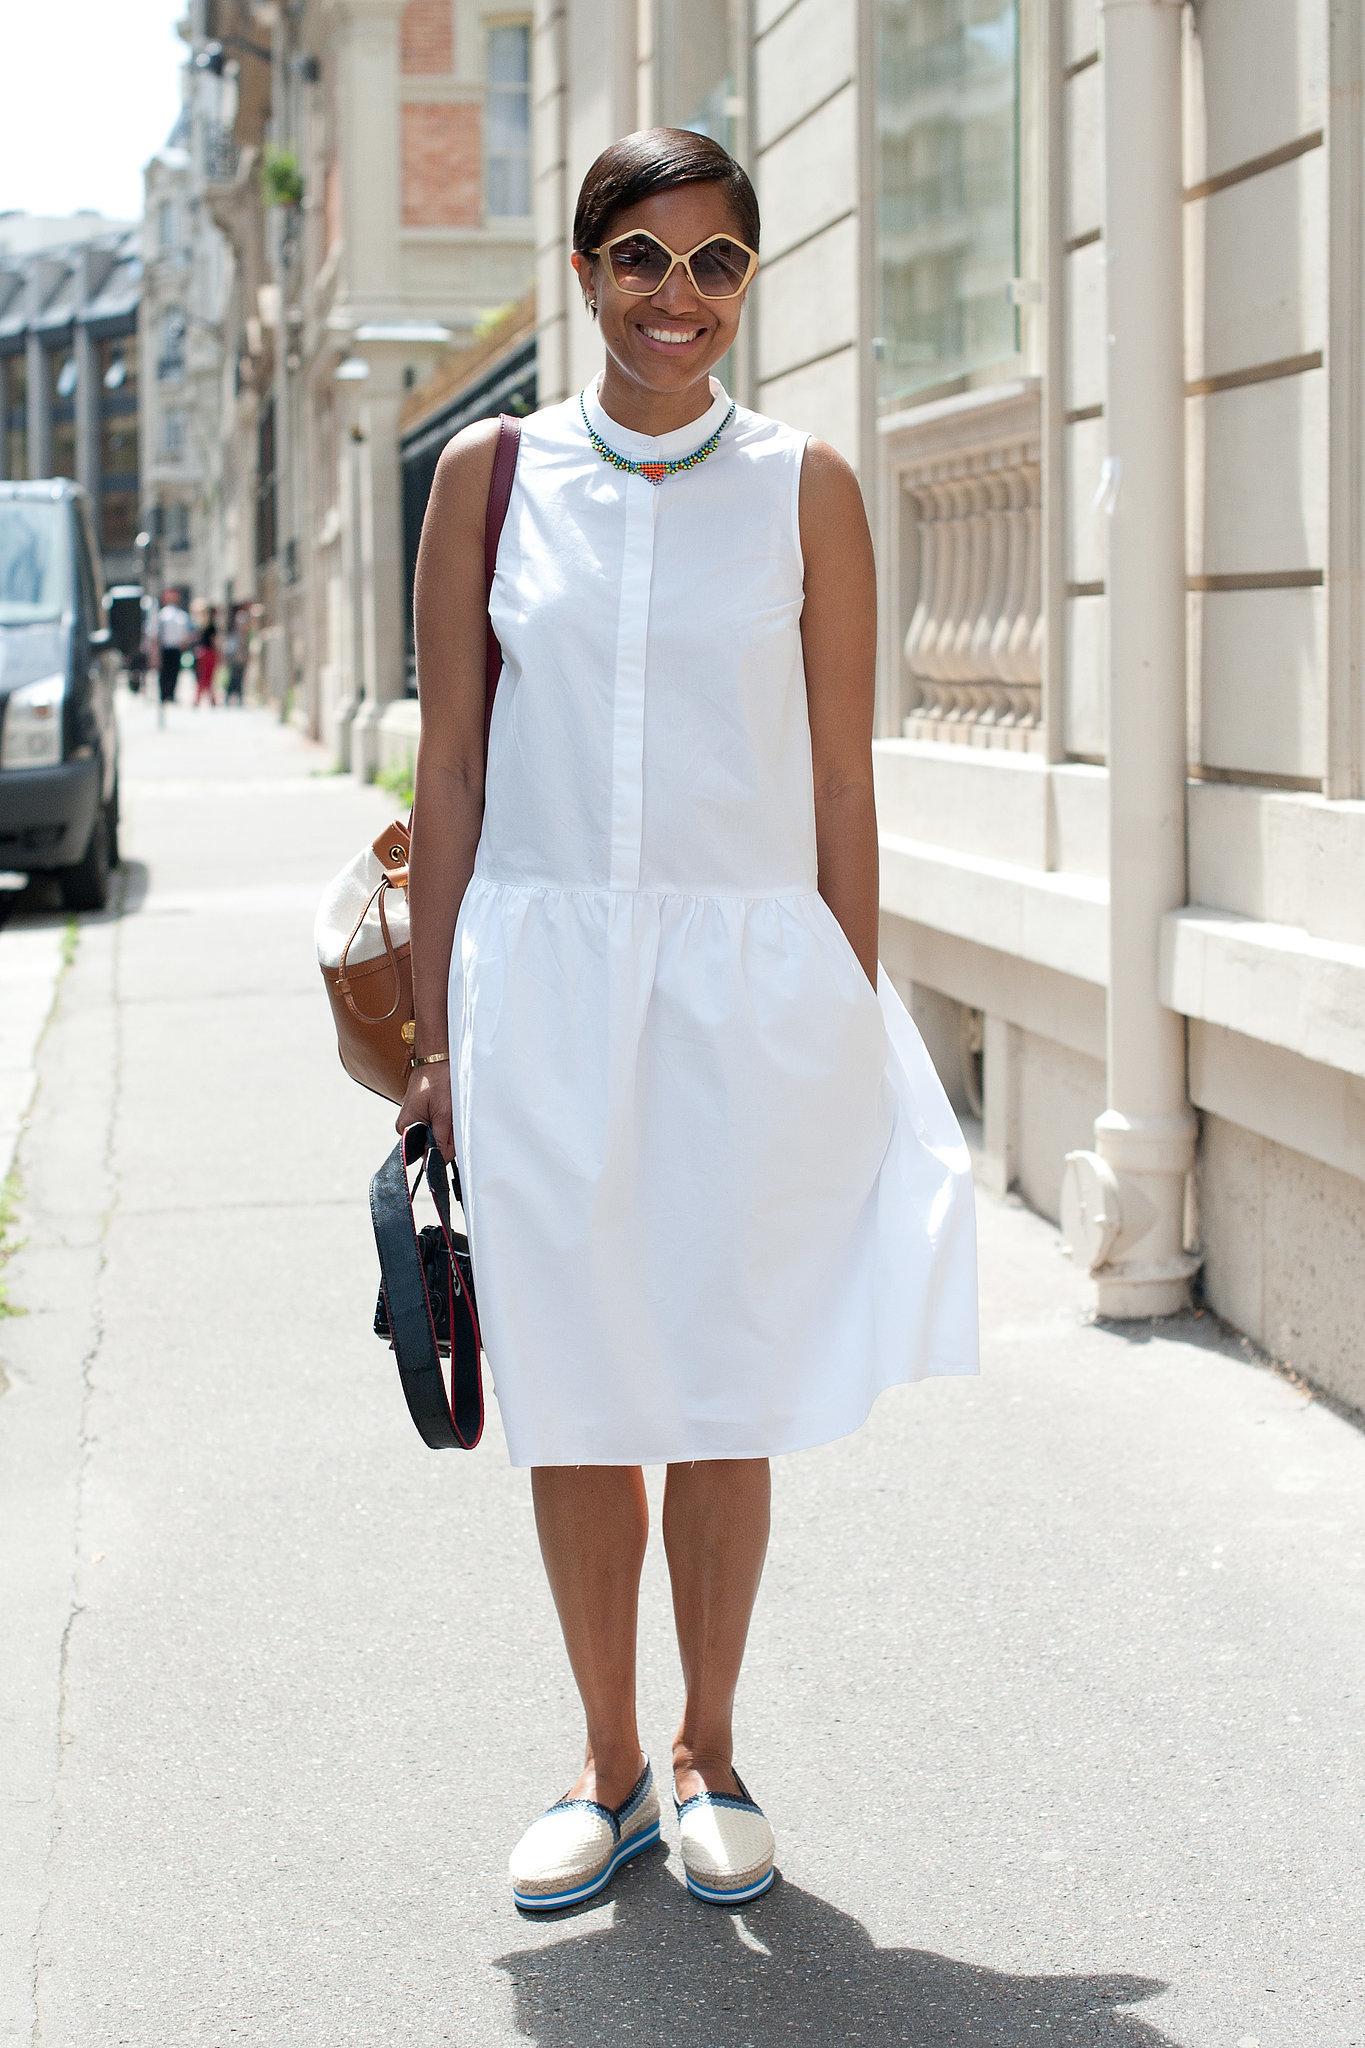 Tamu McPherson took the minimalist approach in a crisp white dress and flats.